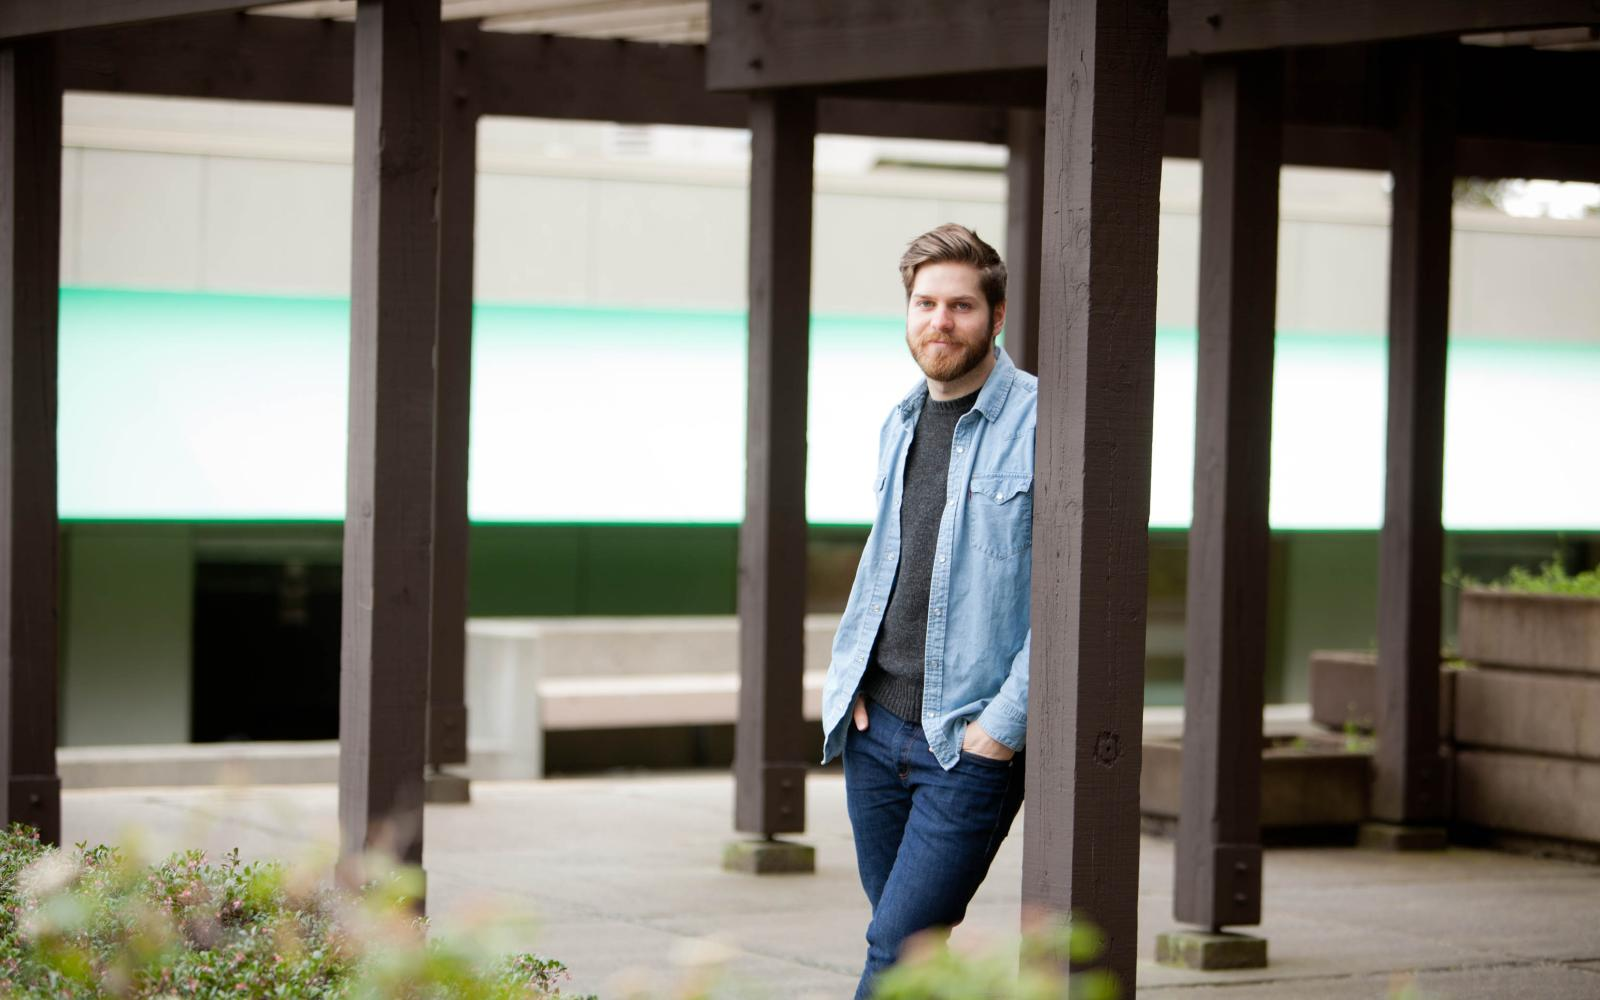 VIU Student, Matt Lineker